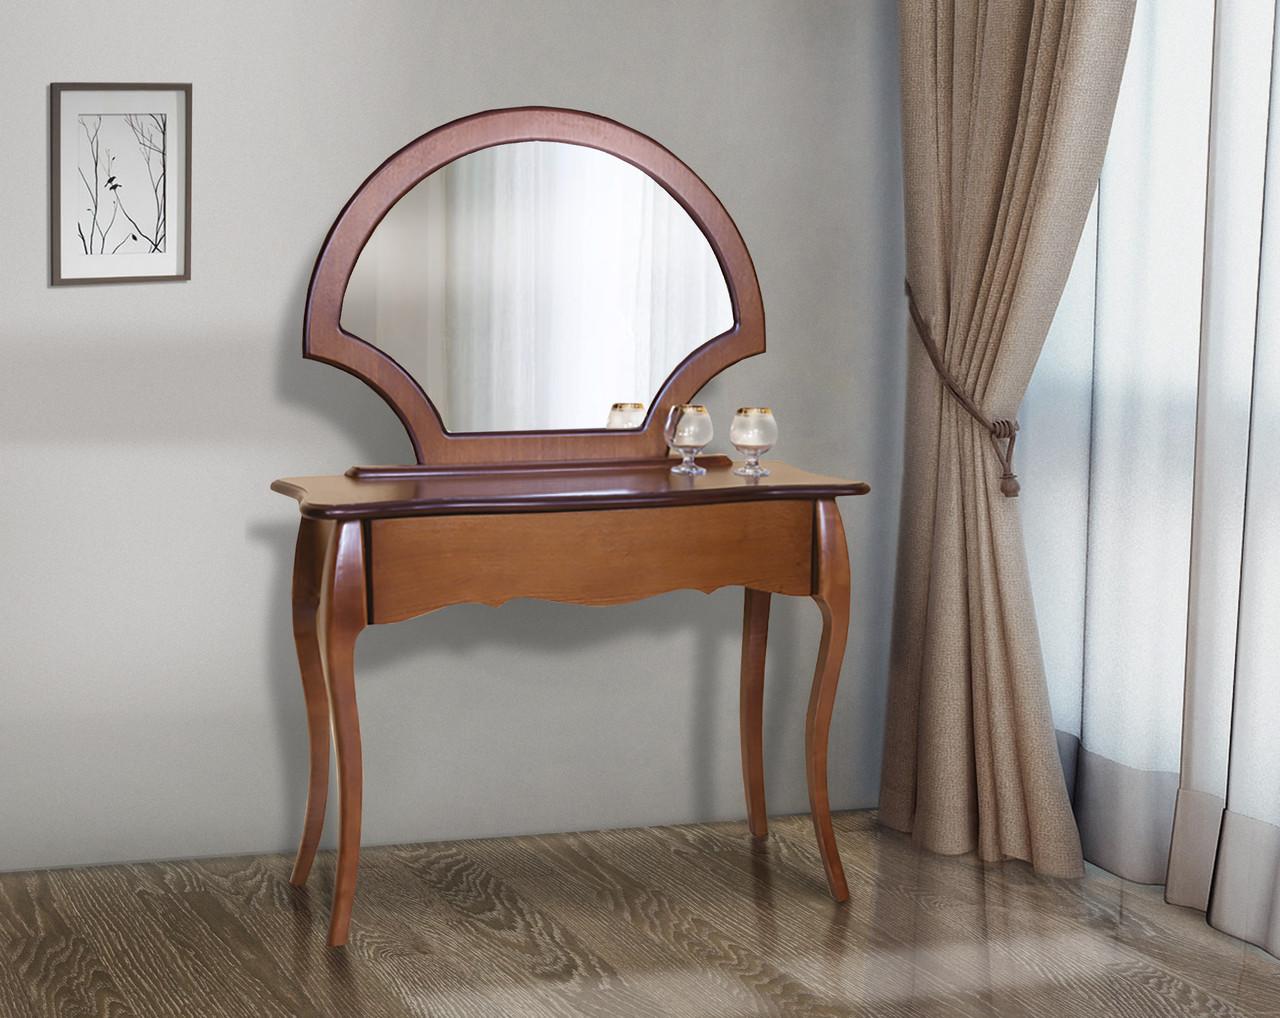 Стол-трюмо Камелия (без зеркала)  Модуль люкс, орех темный